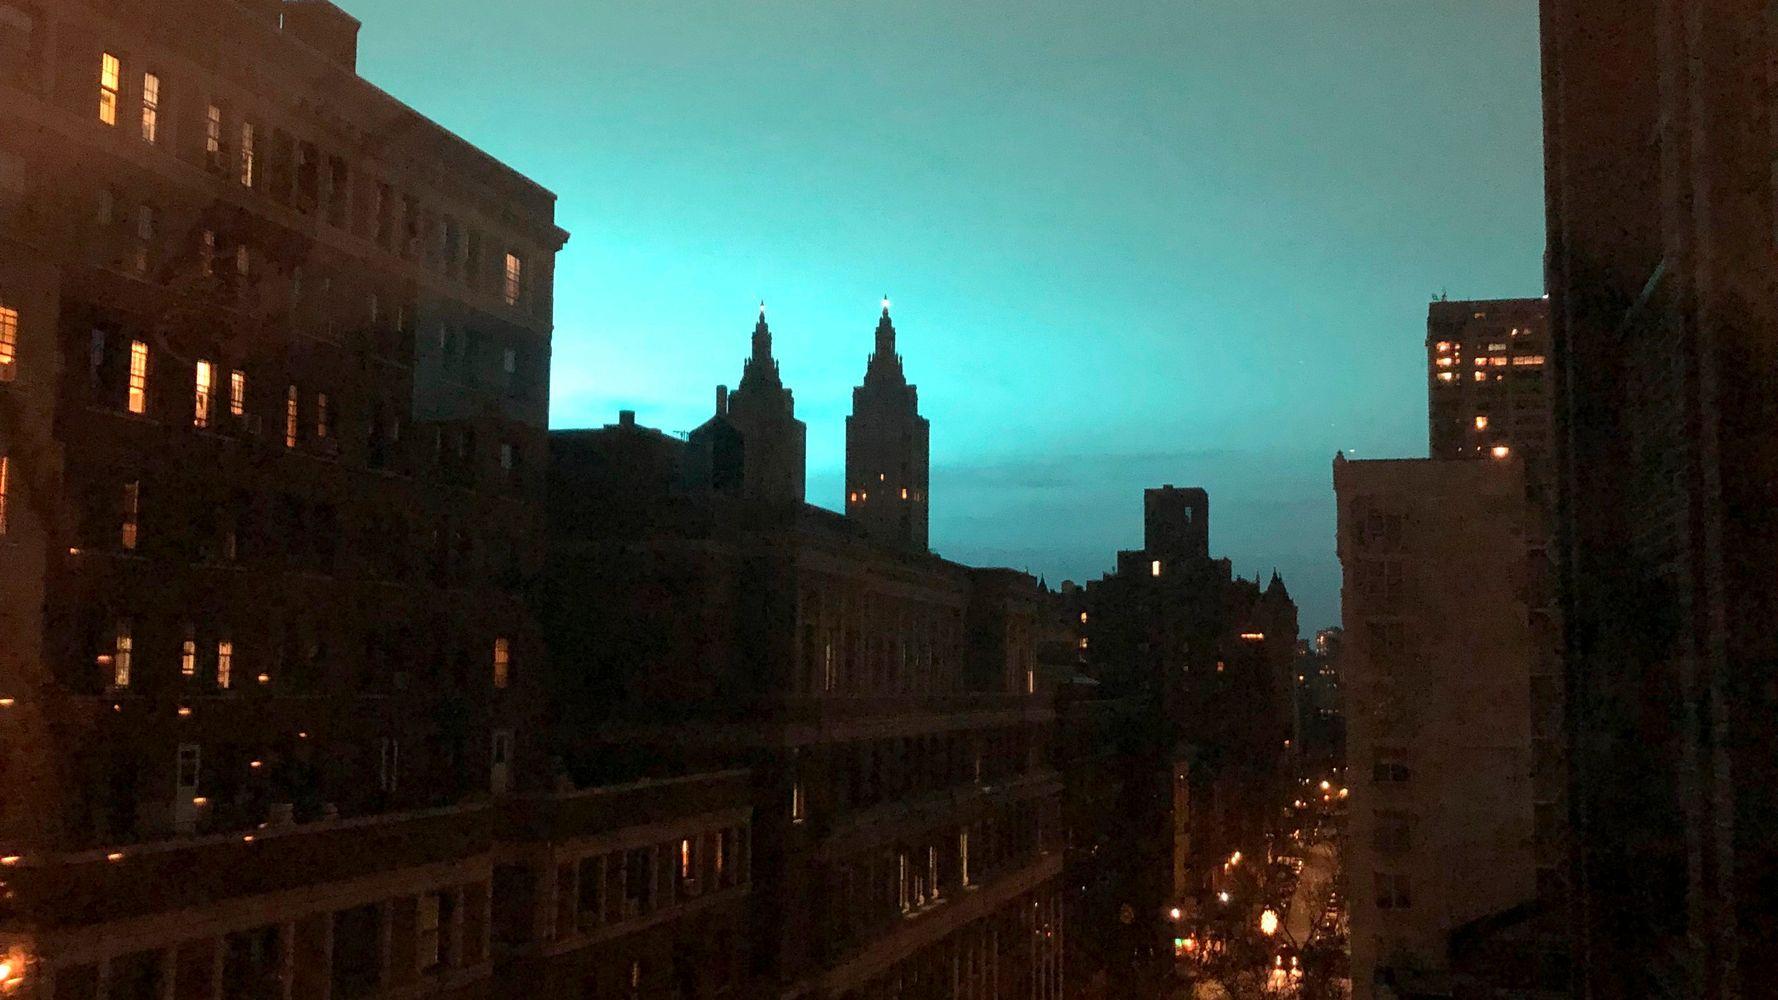 Blue Light Illuminates Sky In Queens As Electrical Arc Rocks